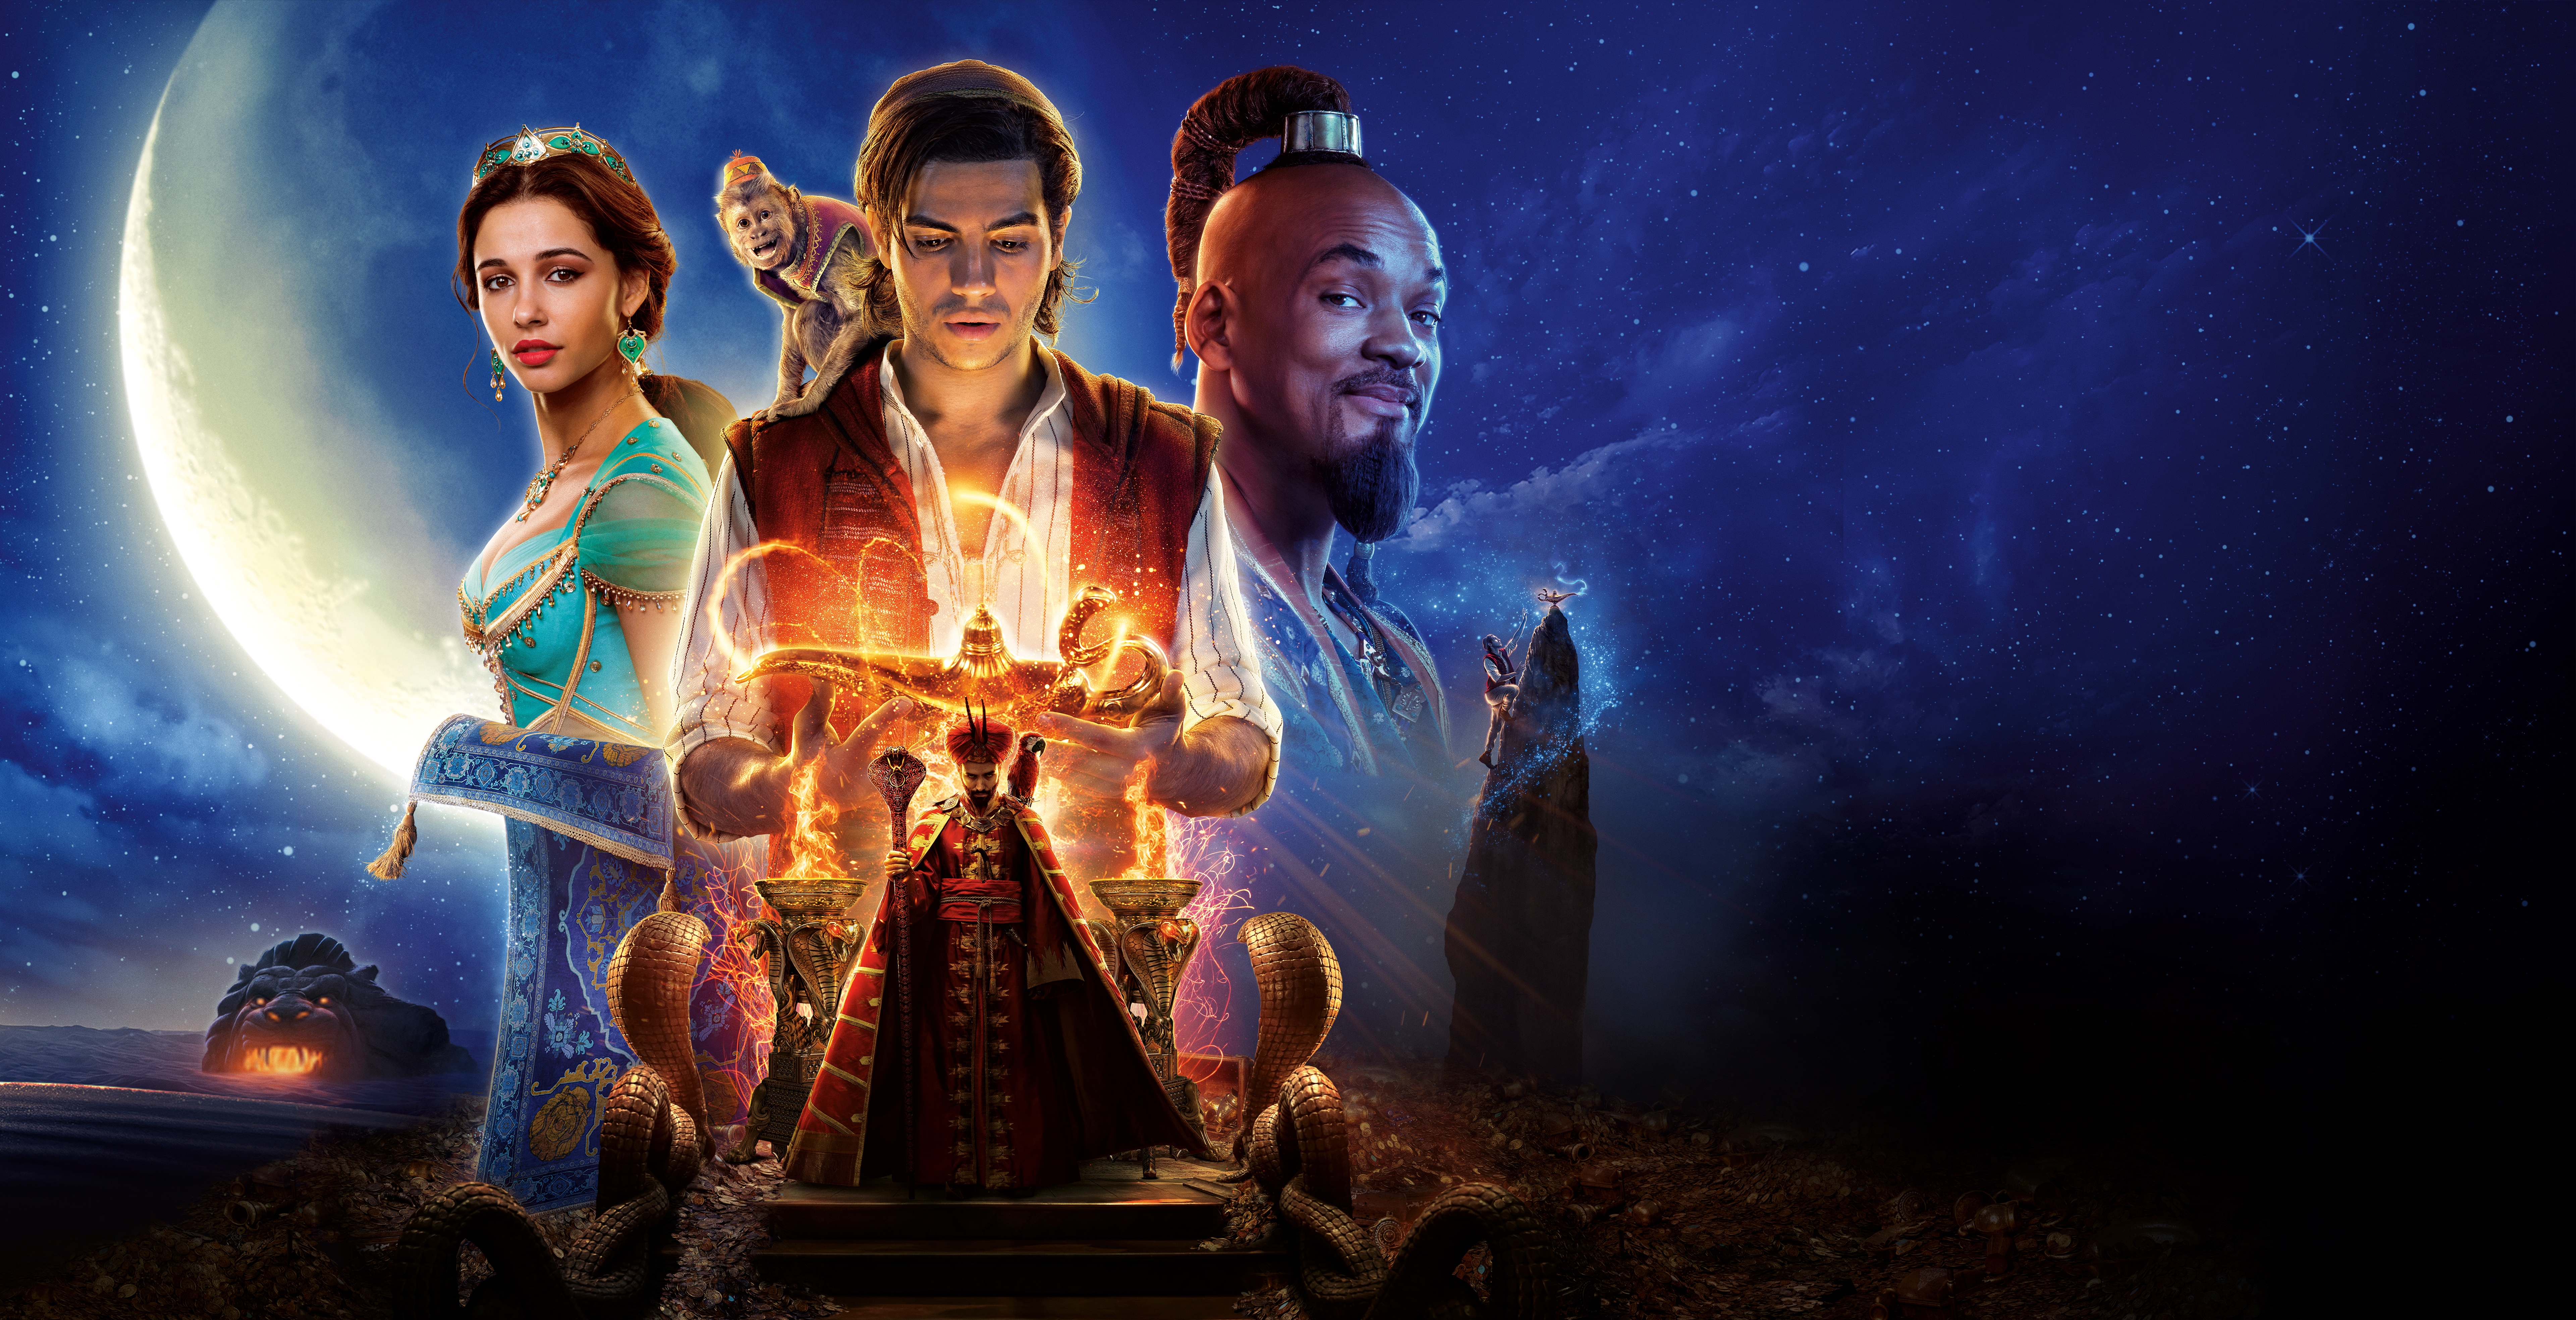 Aladdin 2019 5k Retina Ultra Hd обои фон 7680x3934